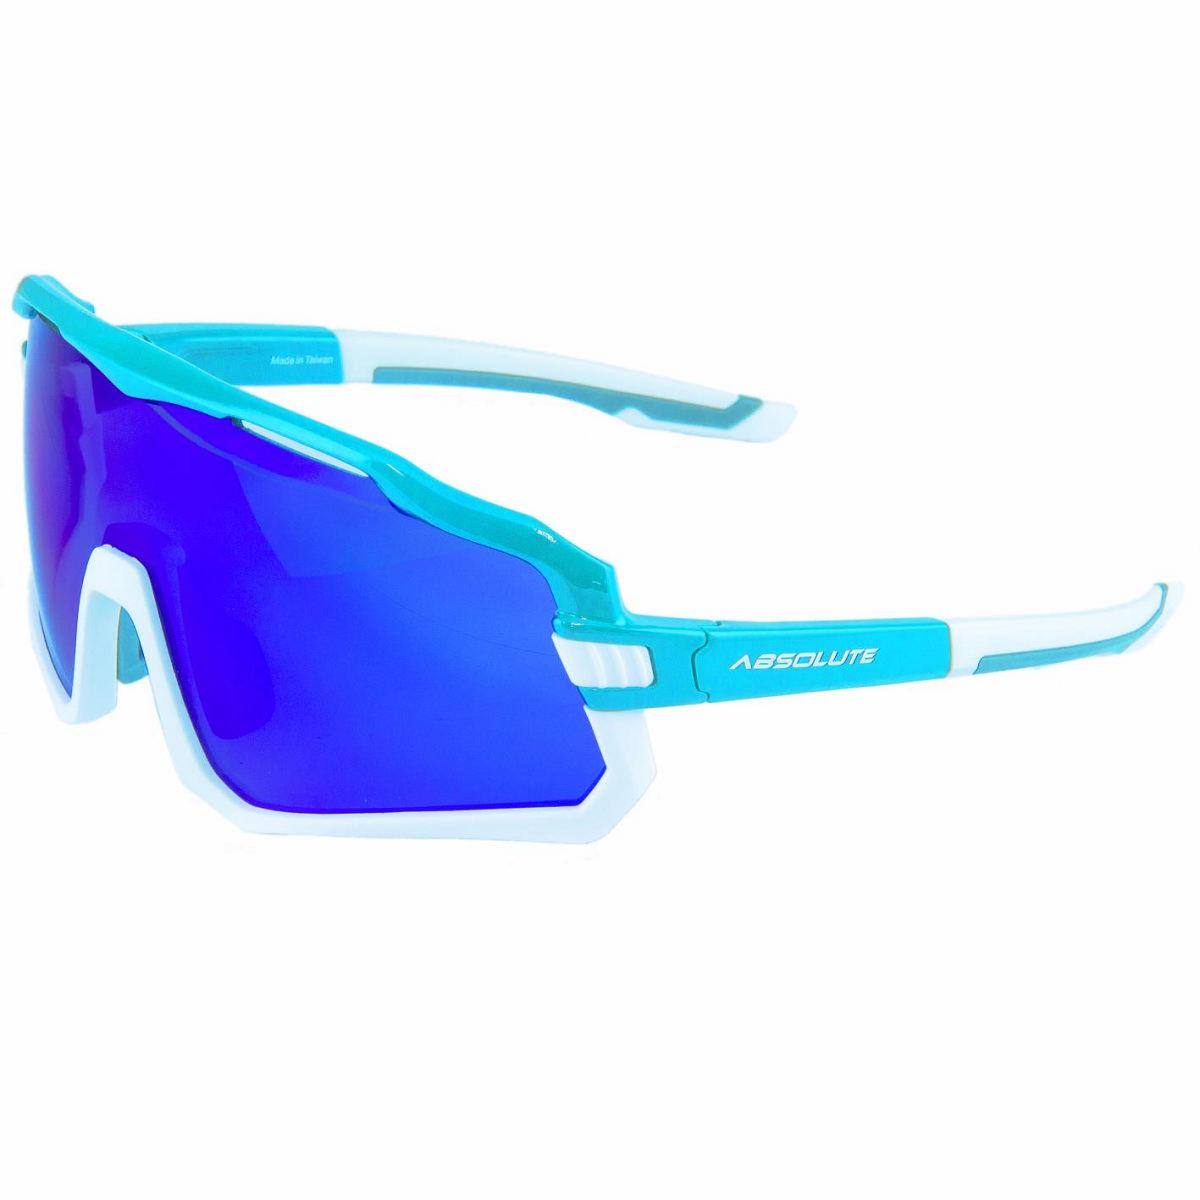 Oculos Absolute Wild Azul/Bco., Lente Azul